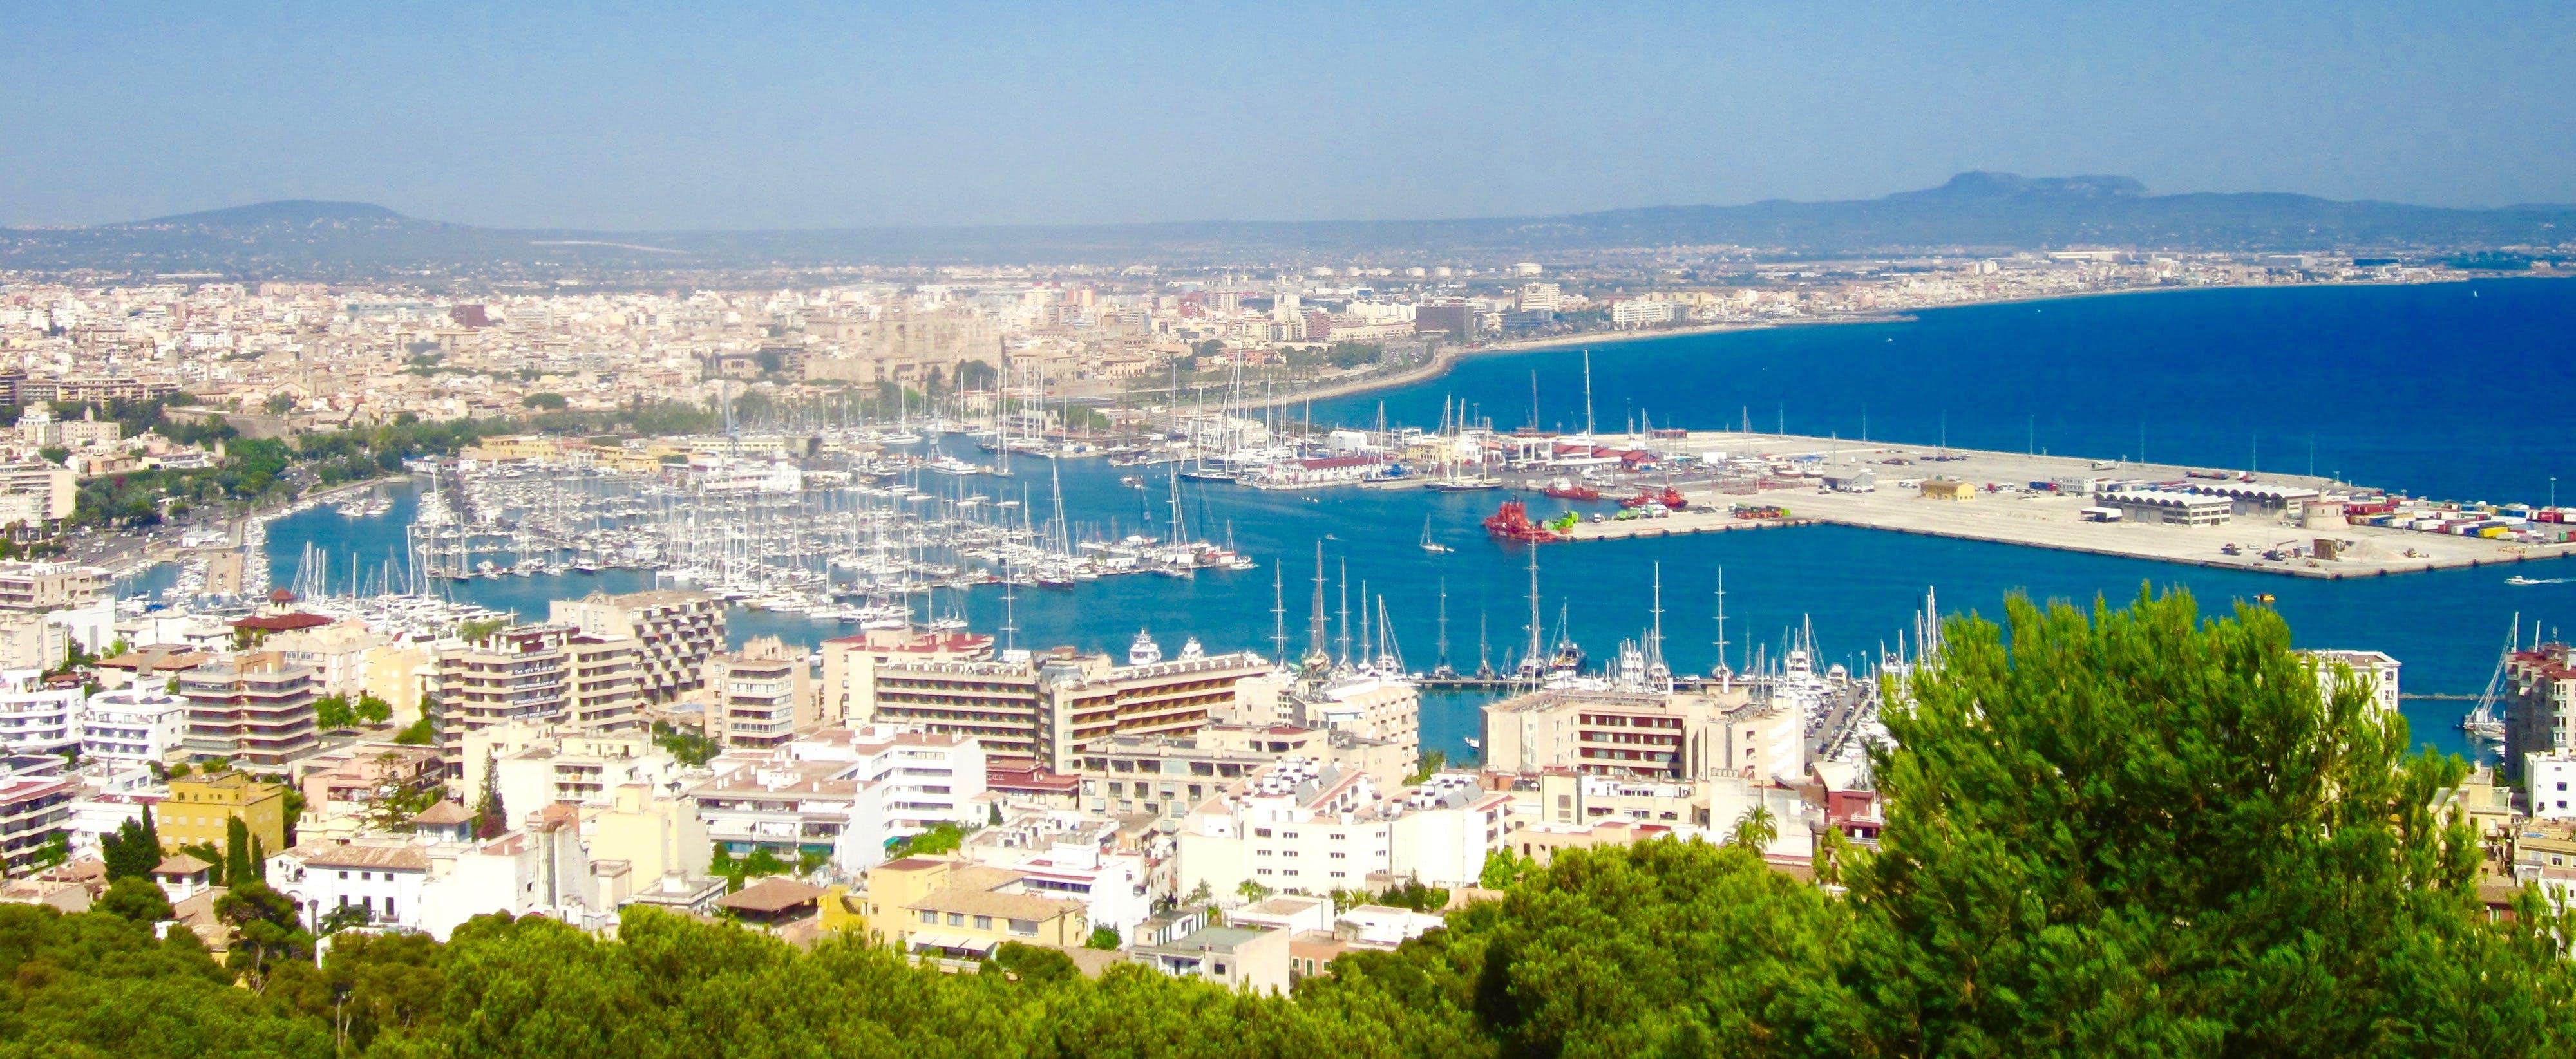 Free stock photo of marina, mediterranean, sailboat, sailboats